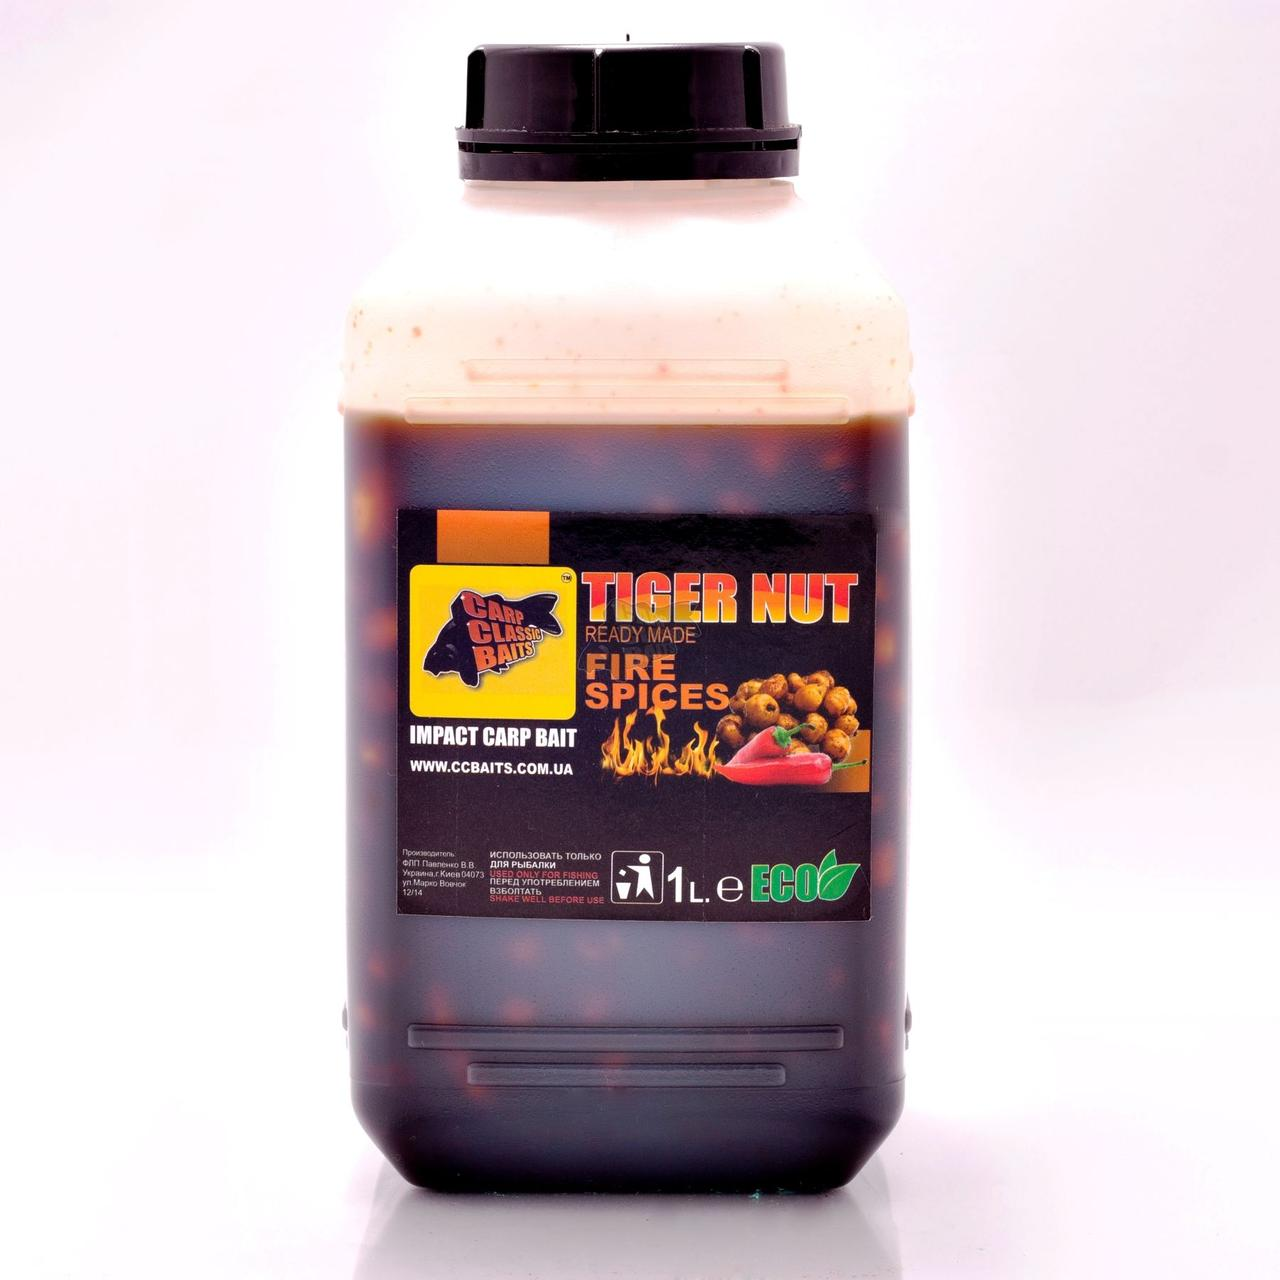 Тигровый Орех Tiger Nut Ready-Made, 1л, 1000, Тигровый Орех, Fire Spice